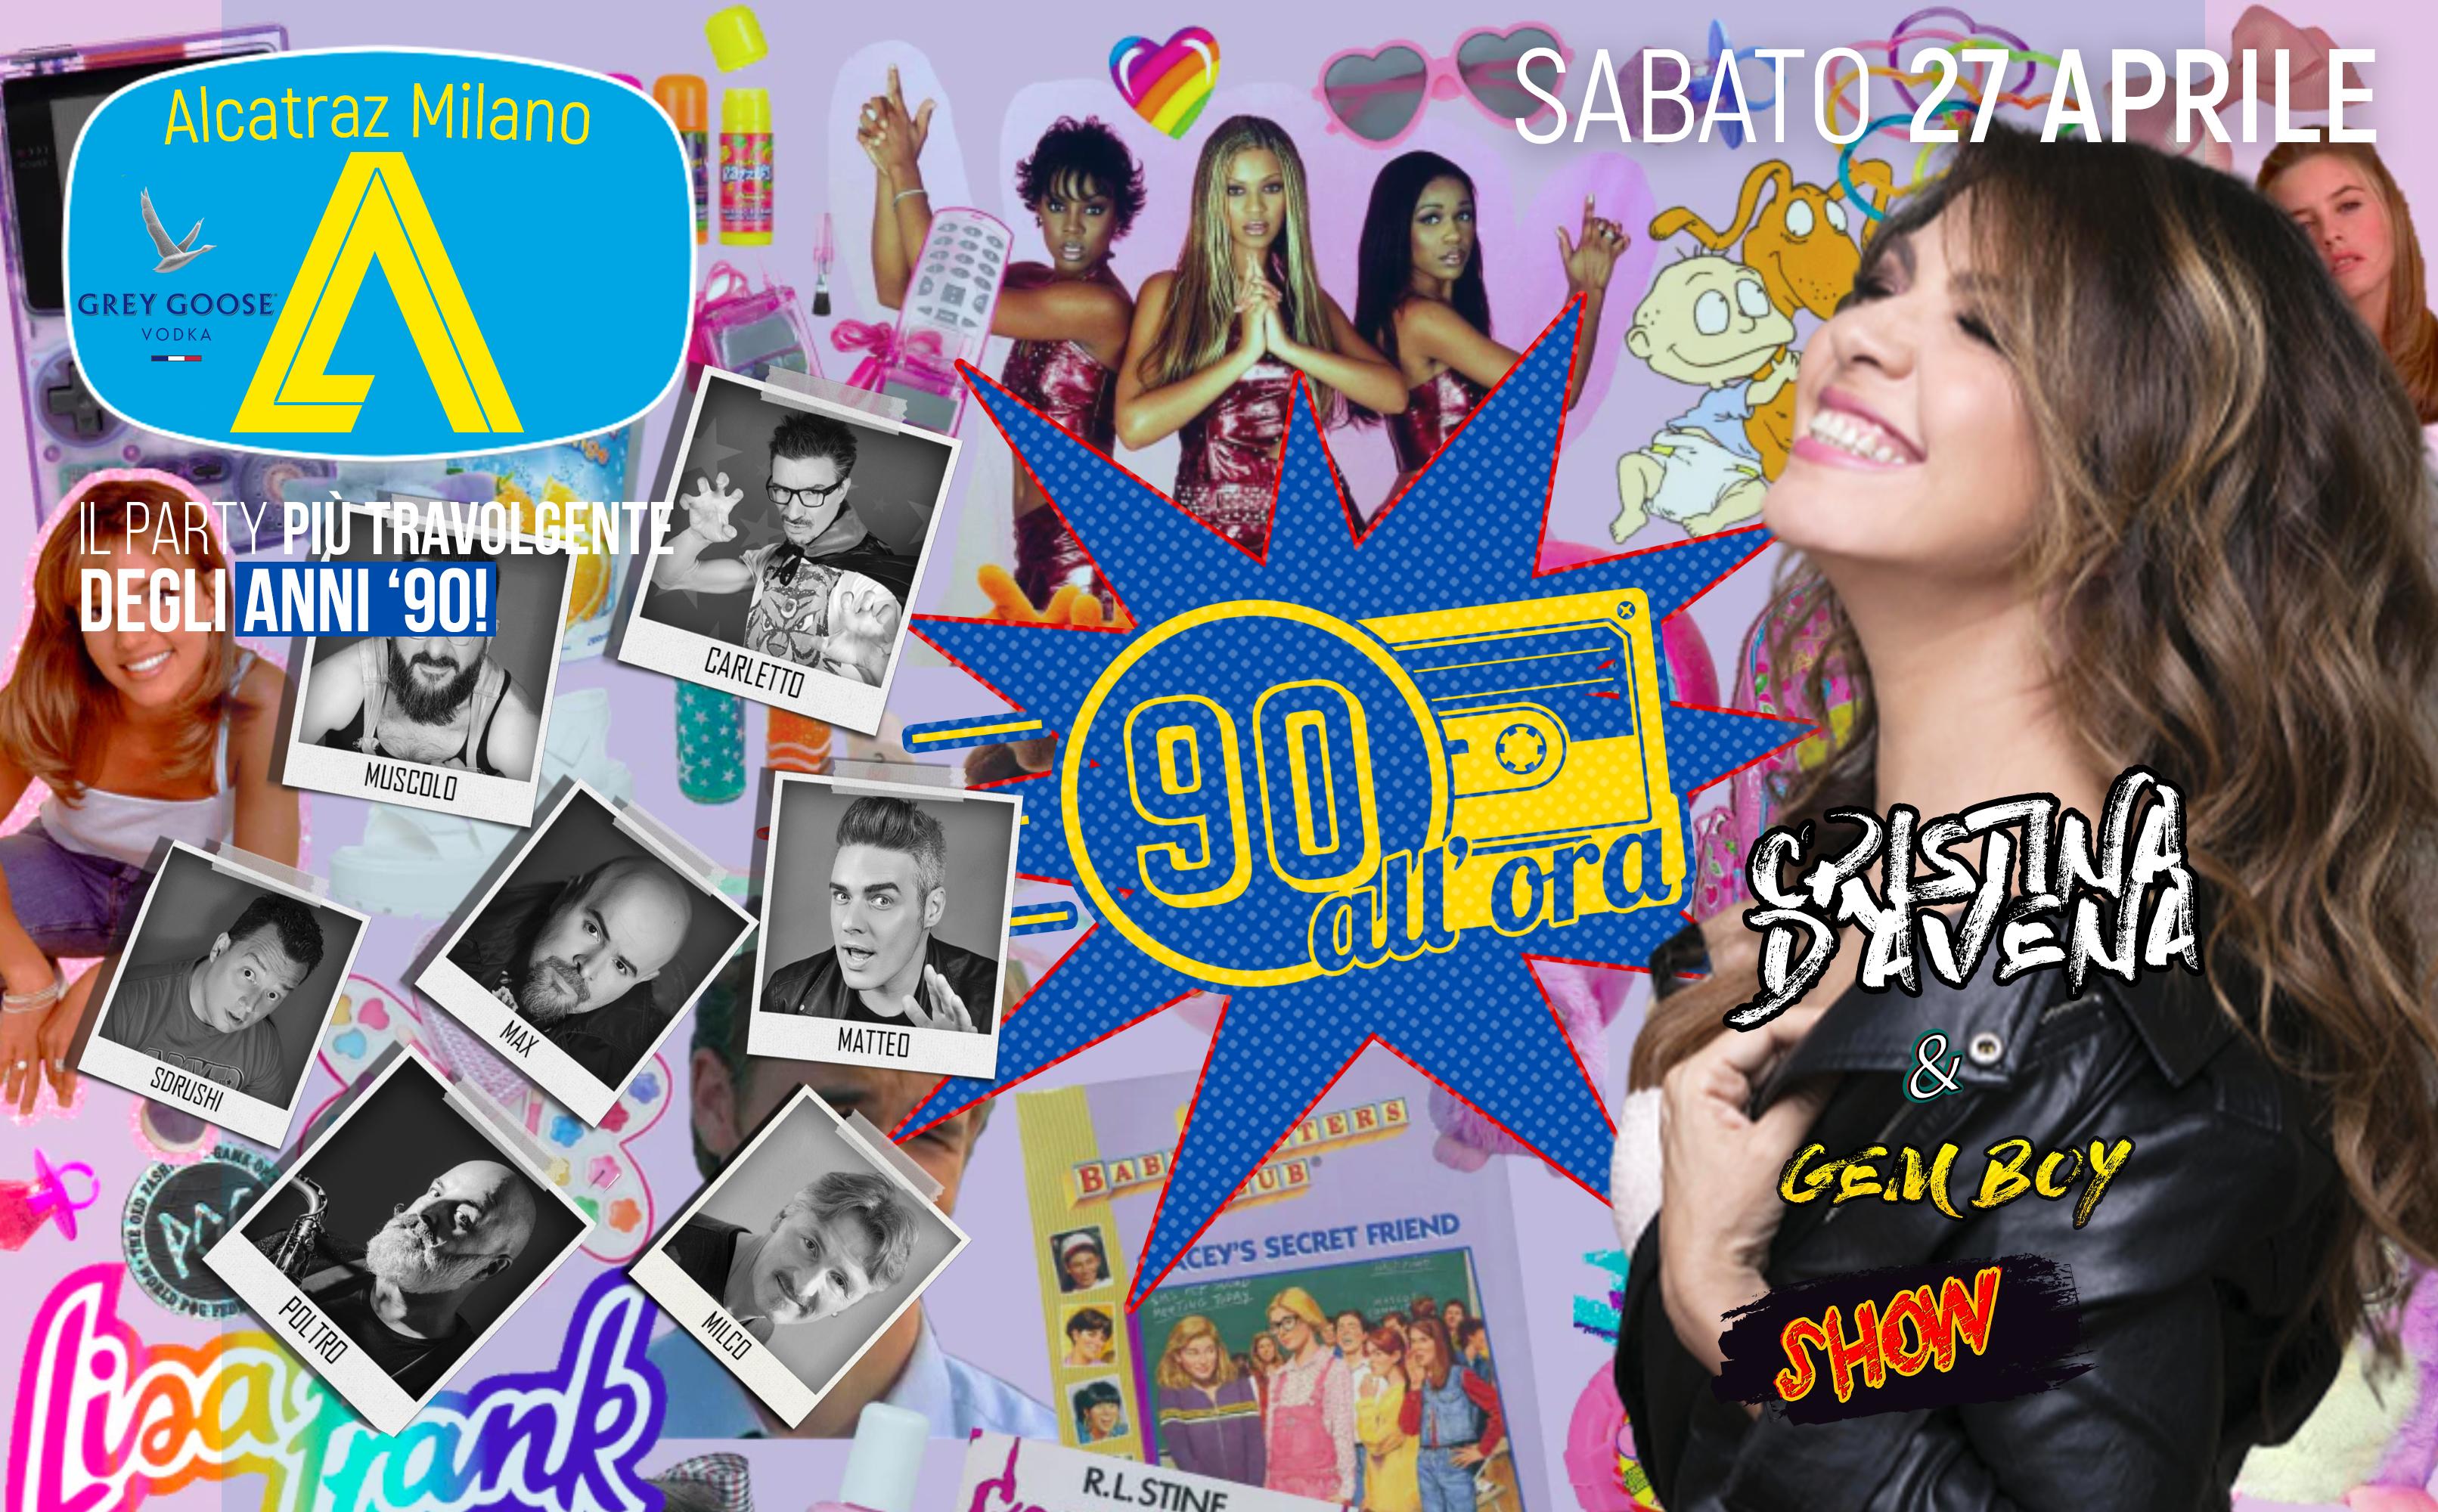 90allora+cristina_website